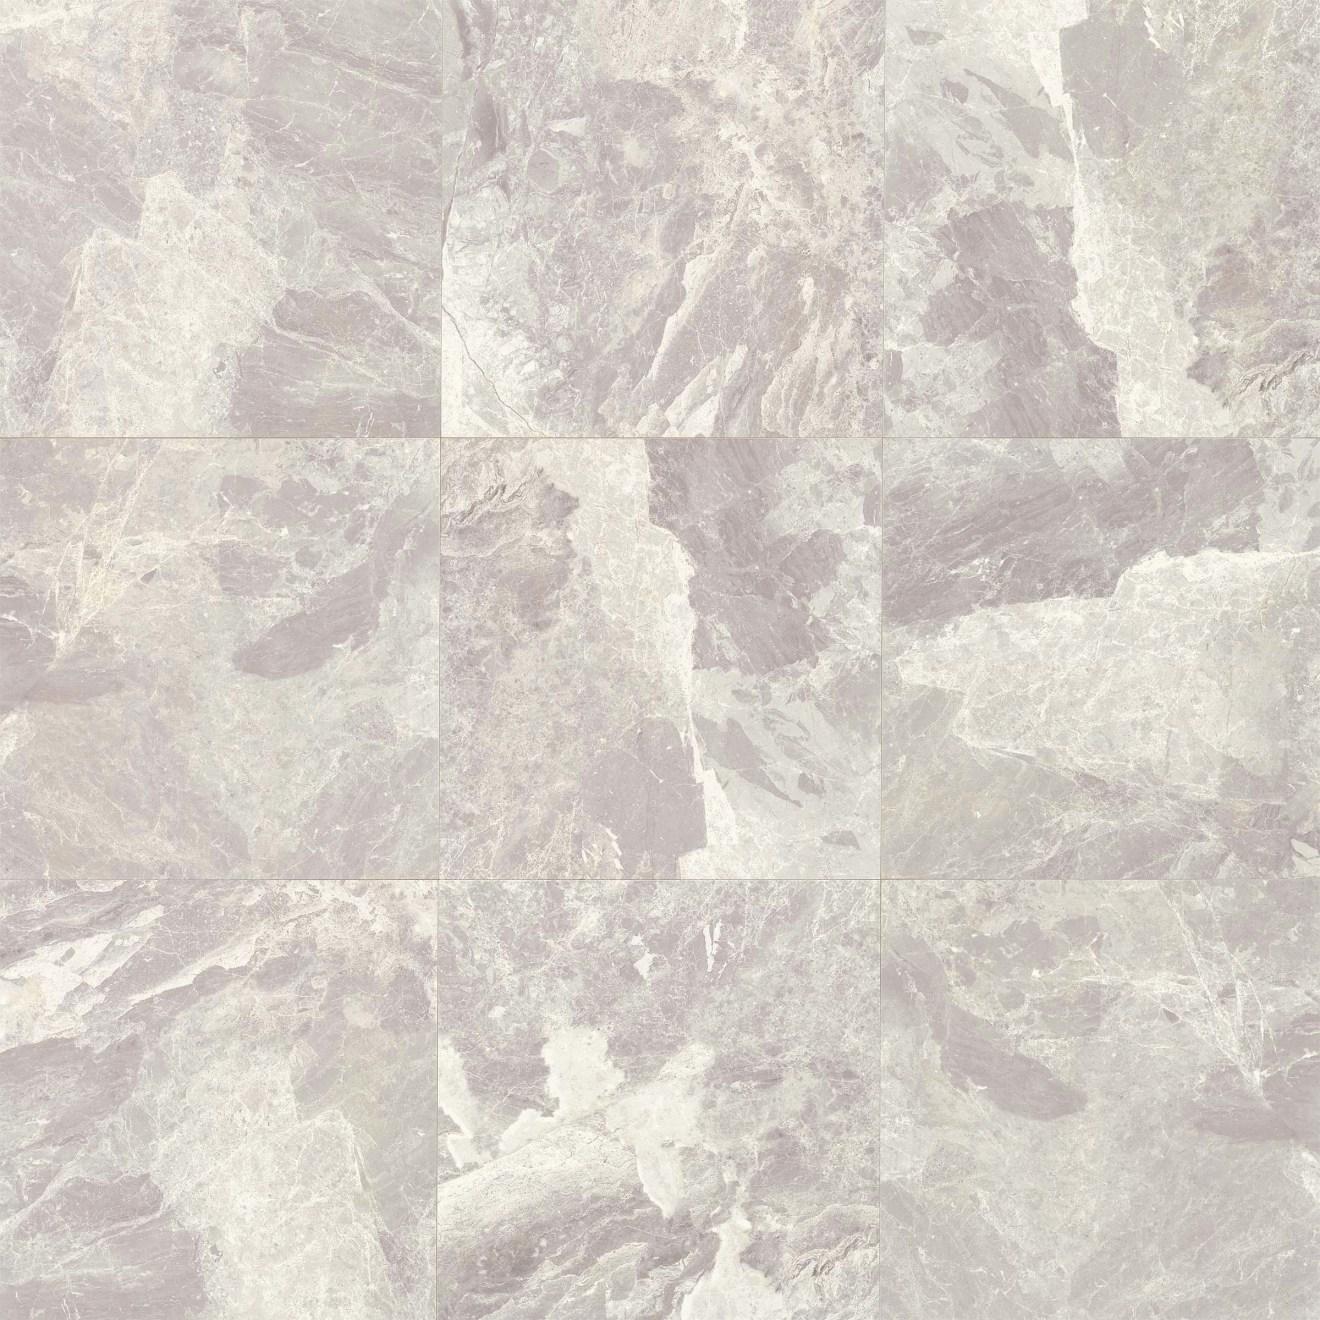 Classic 18 X 18 Floor Wall Tile In Bardiglietto